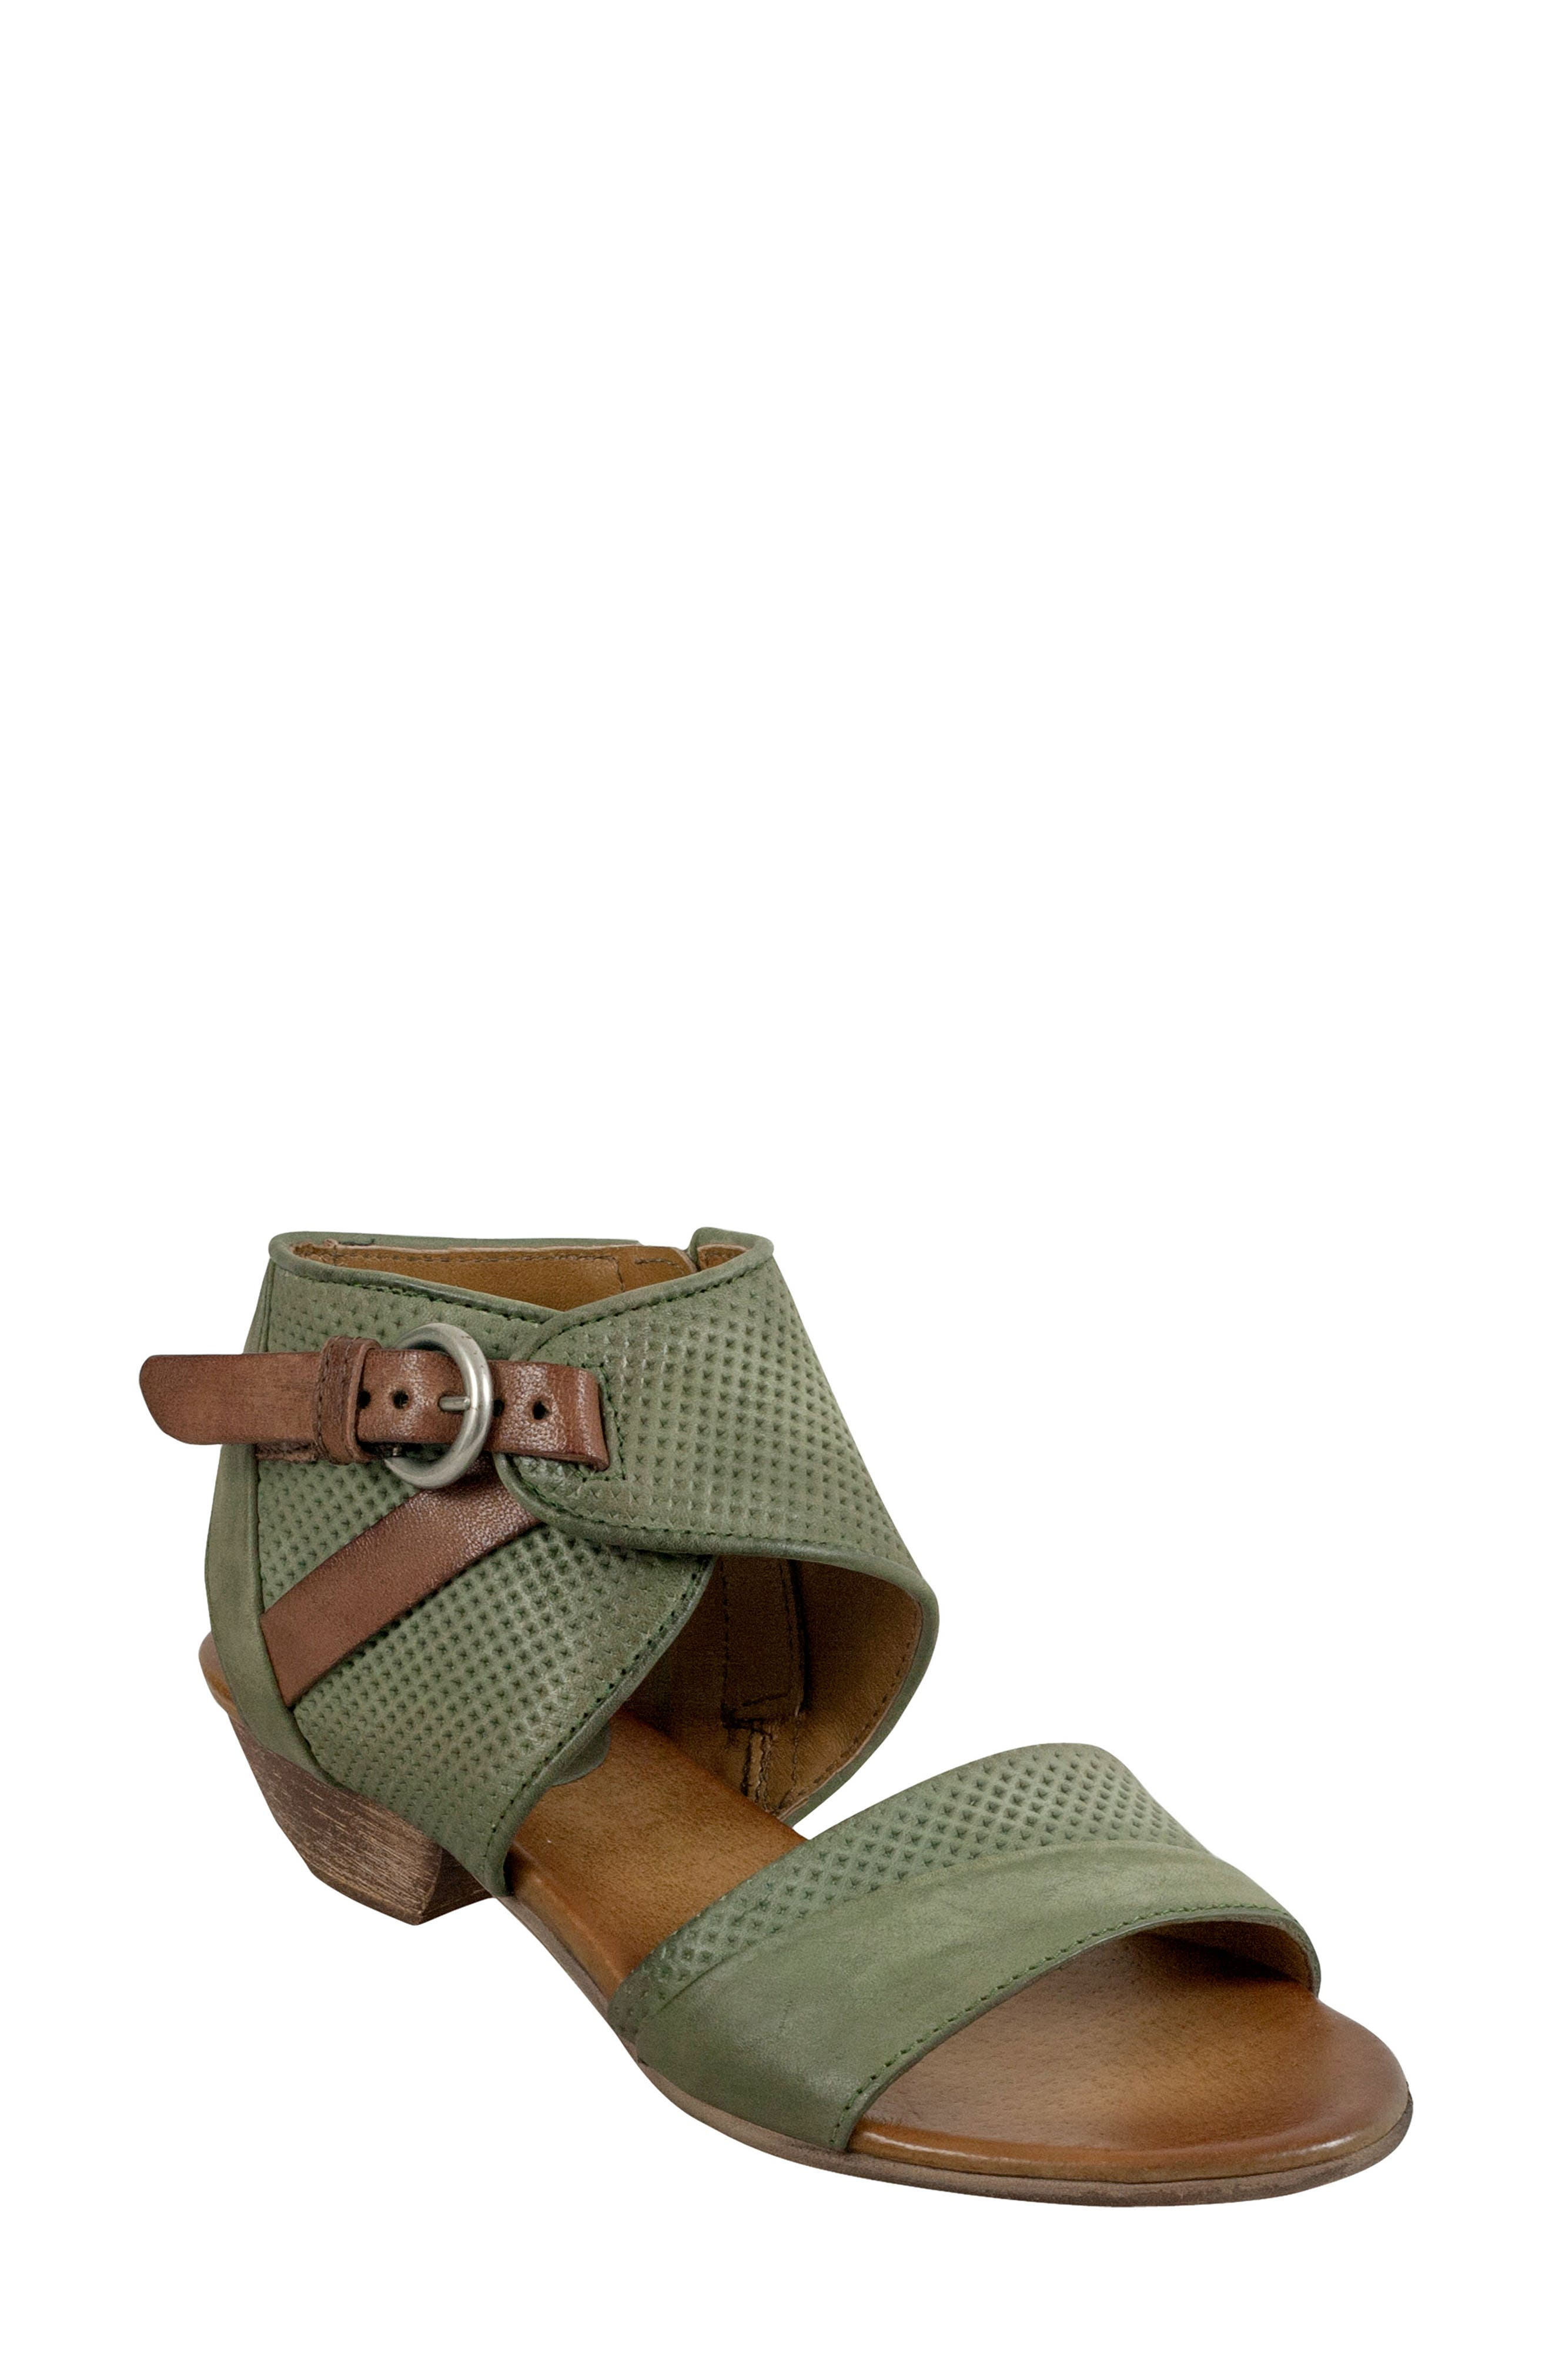 Miz Mooz Chatham Textured Sandal (Women)